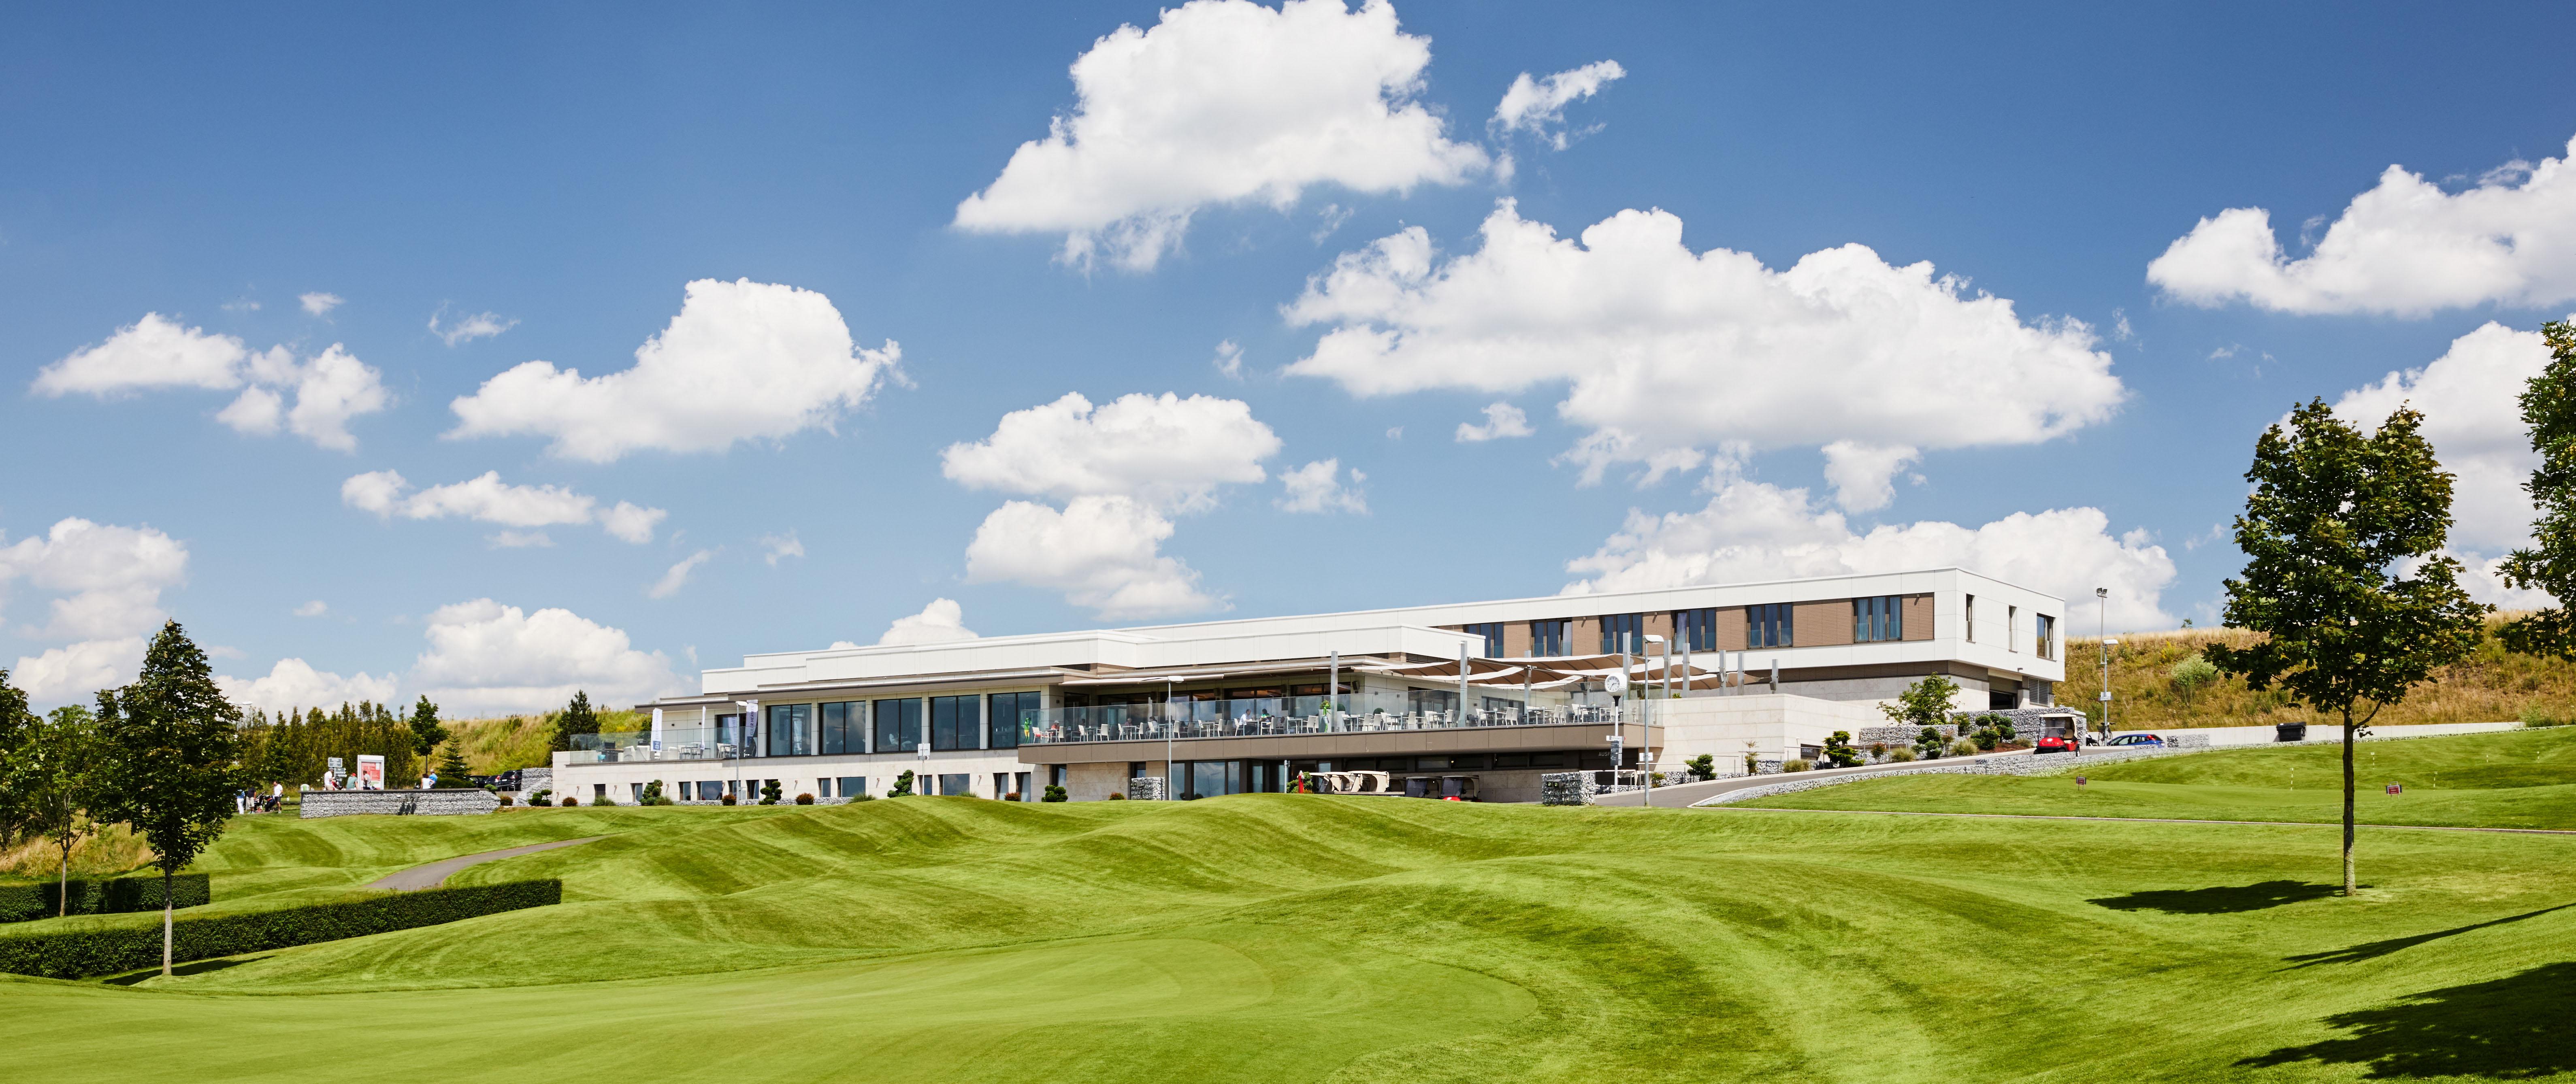 Kölner Golfclub, Golf, Driving Range, Köln, Architekturbüro Schönborn+ Hölscher